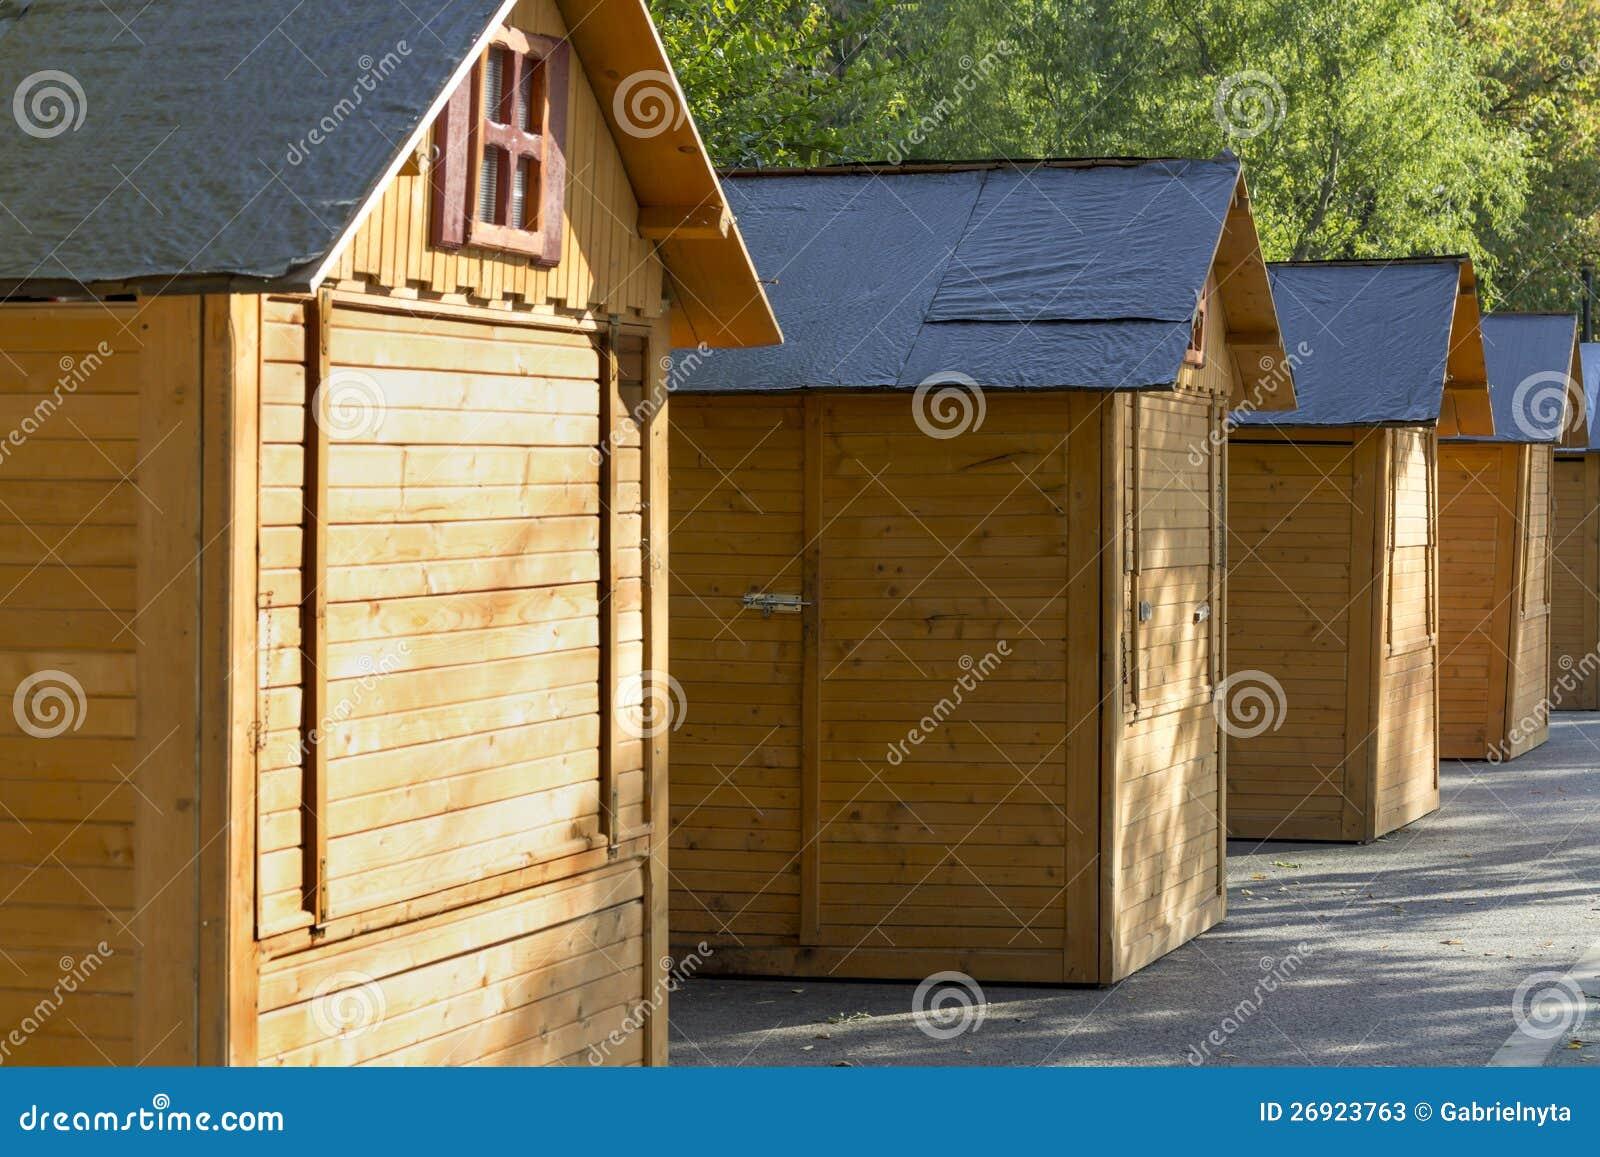 Peque as casas de madera fotos de archivo imagen 26923763 - Casas madera pequenas ...